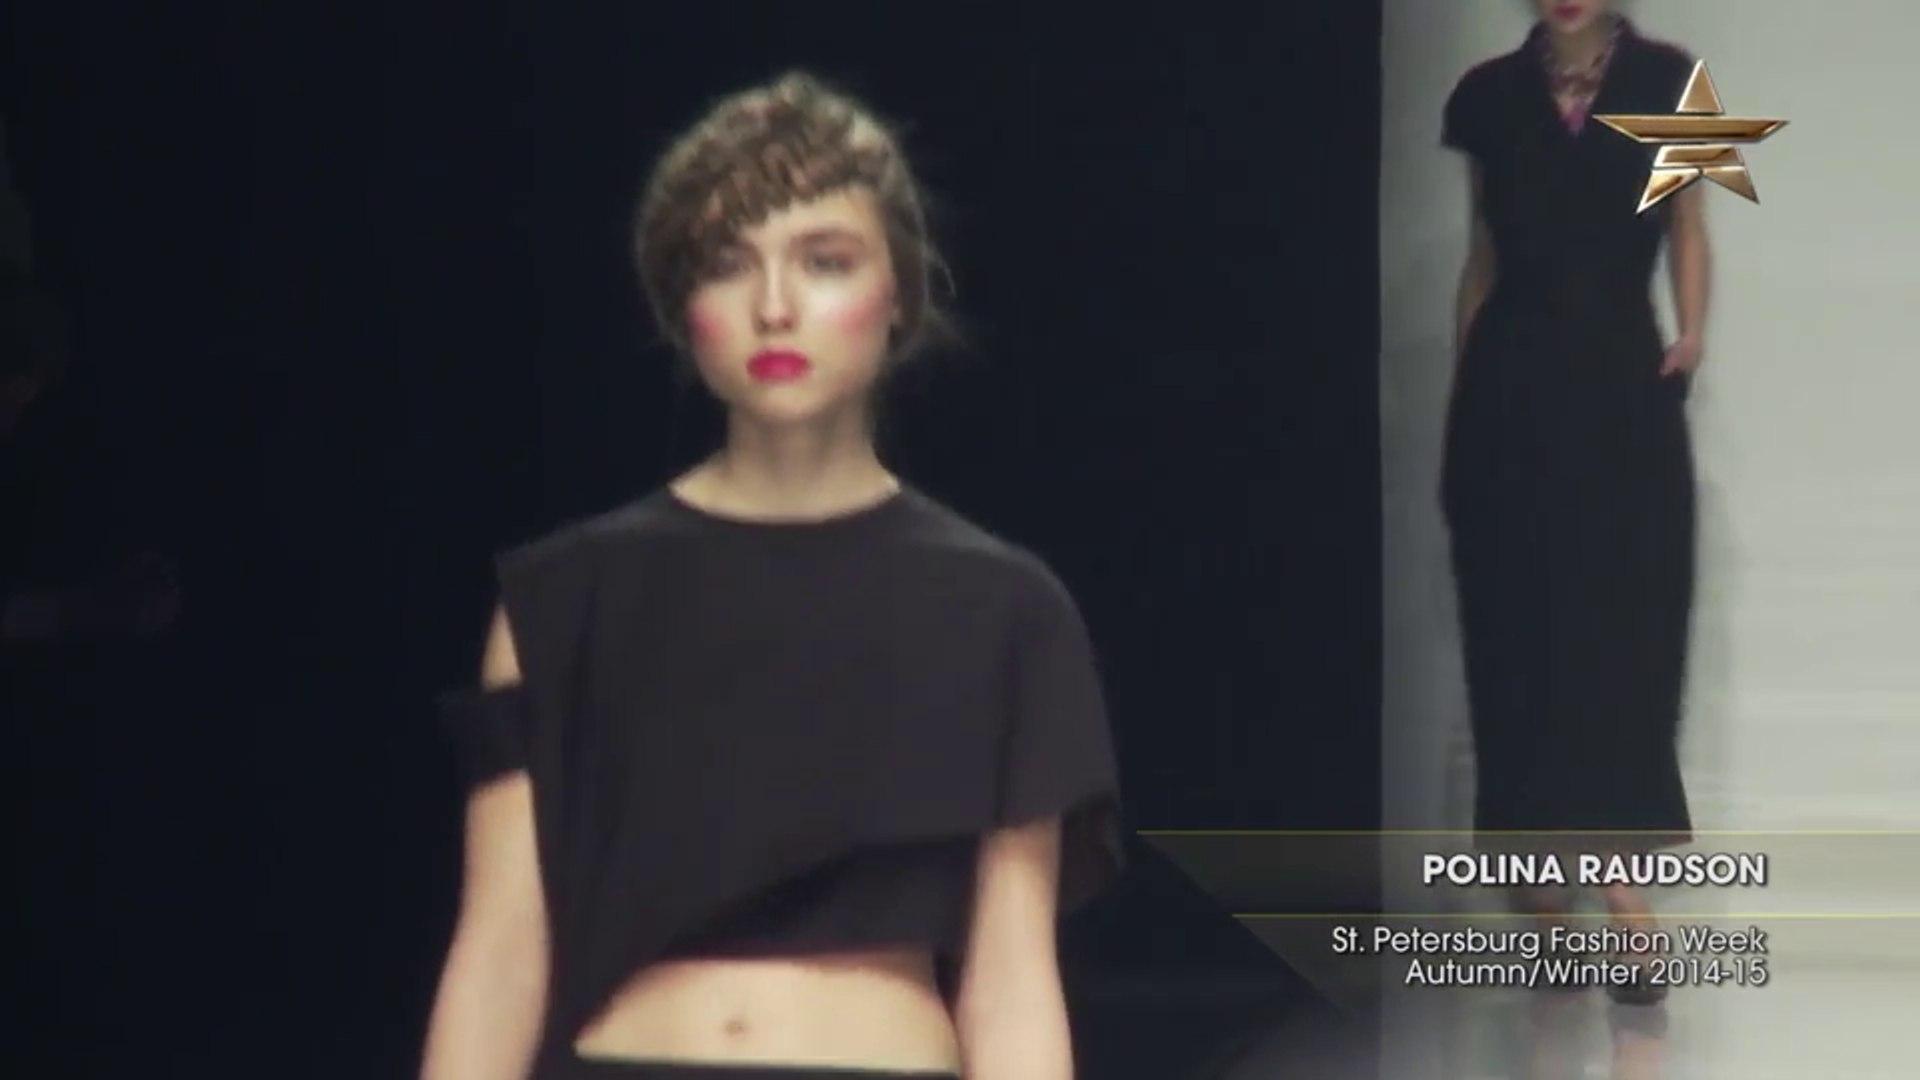 Full Shows POLINA RAUDSON St. Petersburg Fashion Week Autumn Winter 2014-15